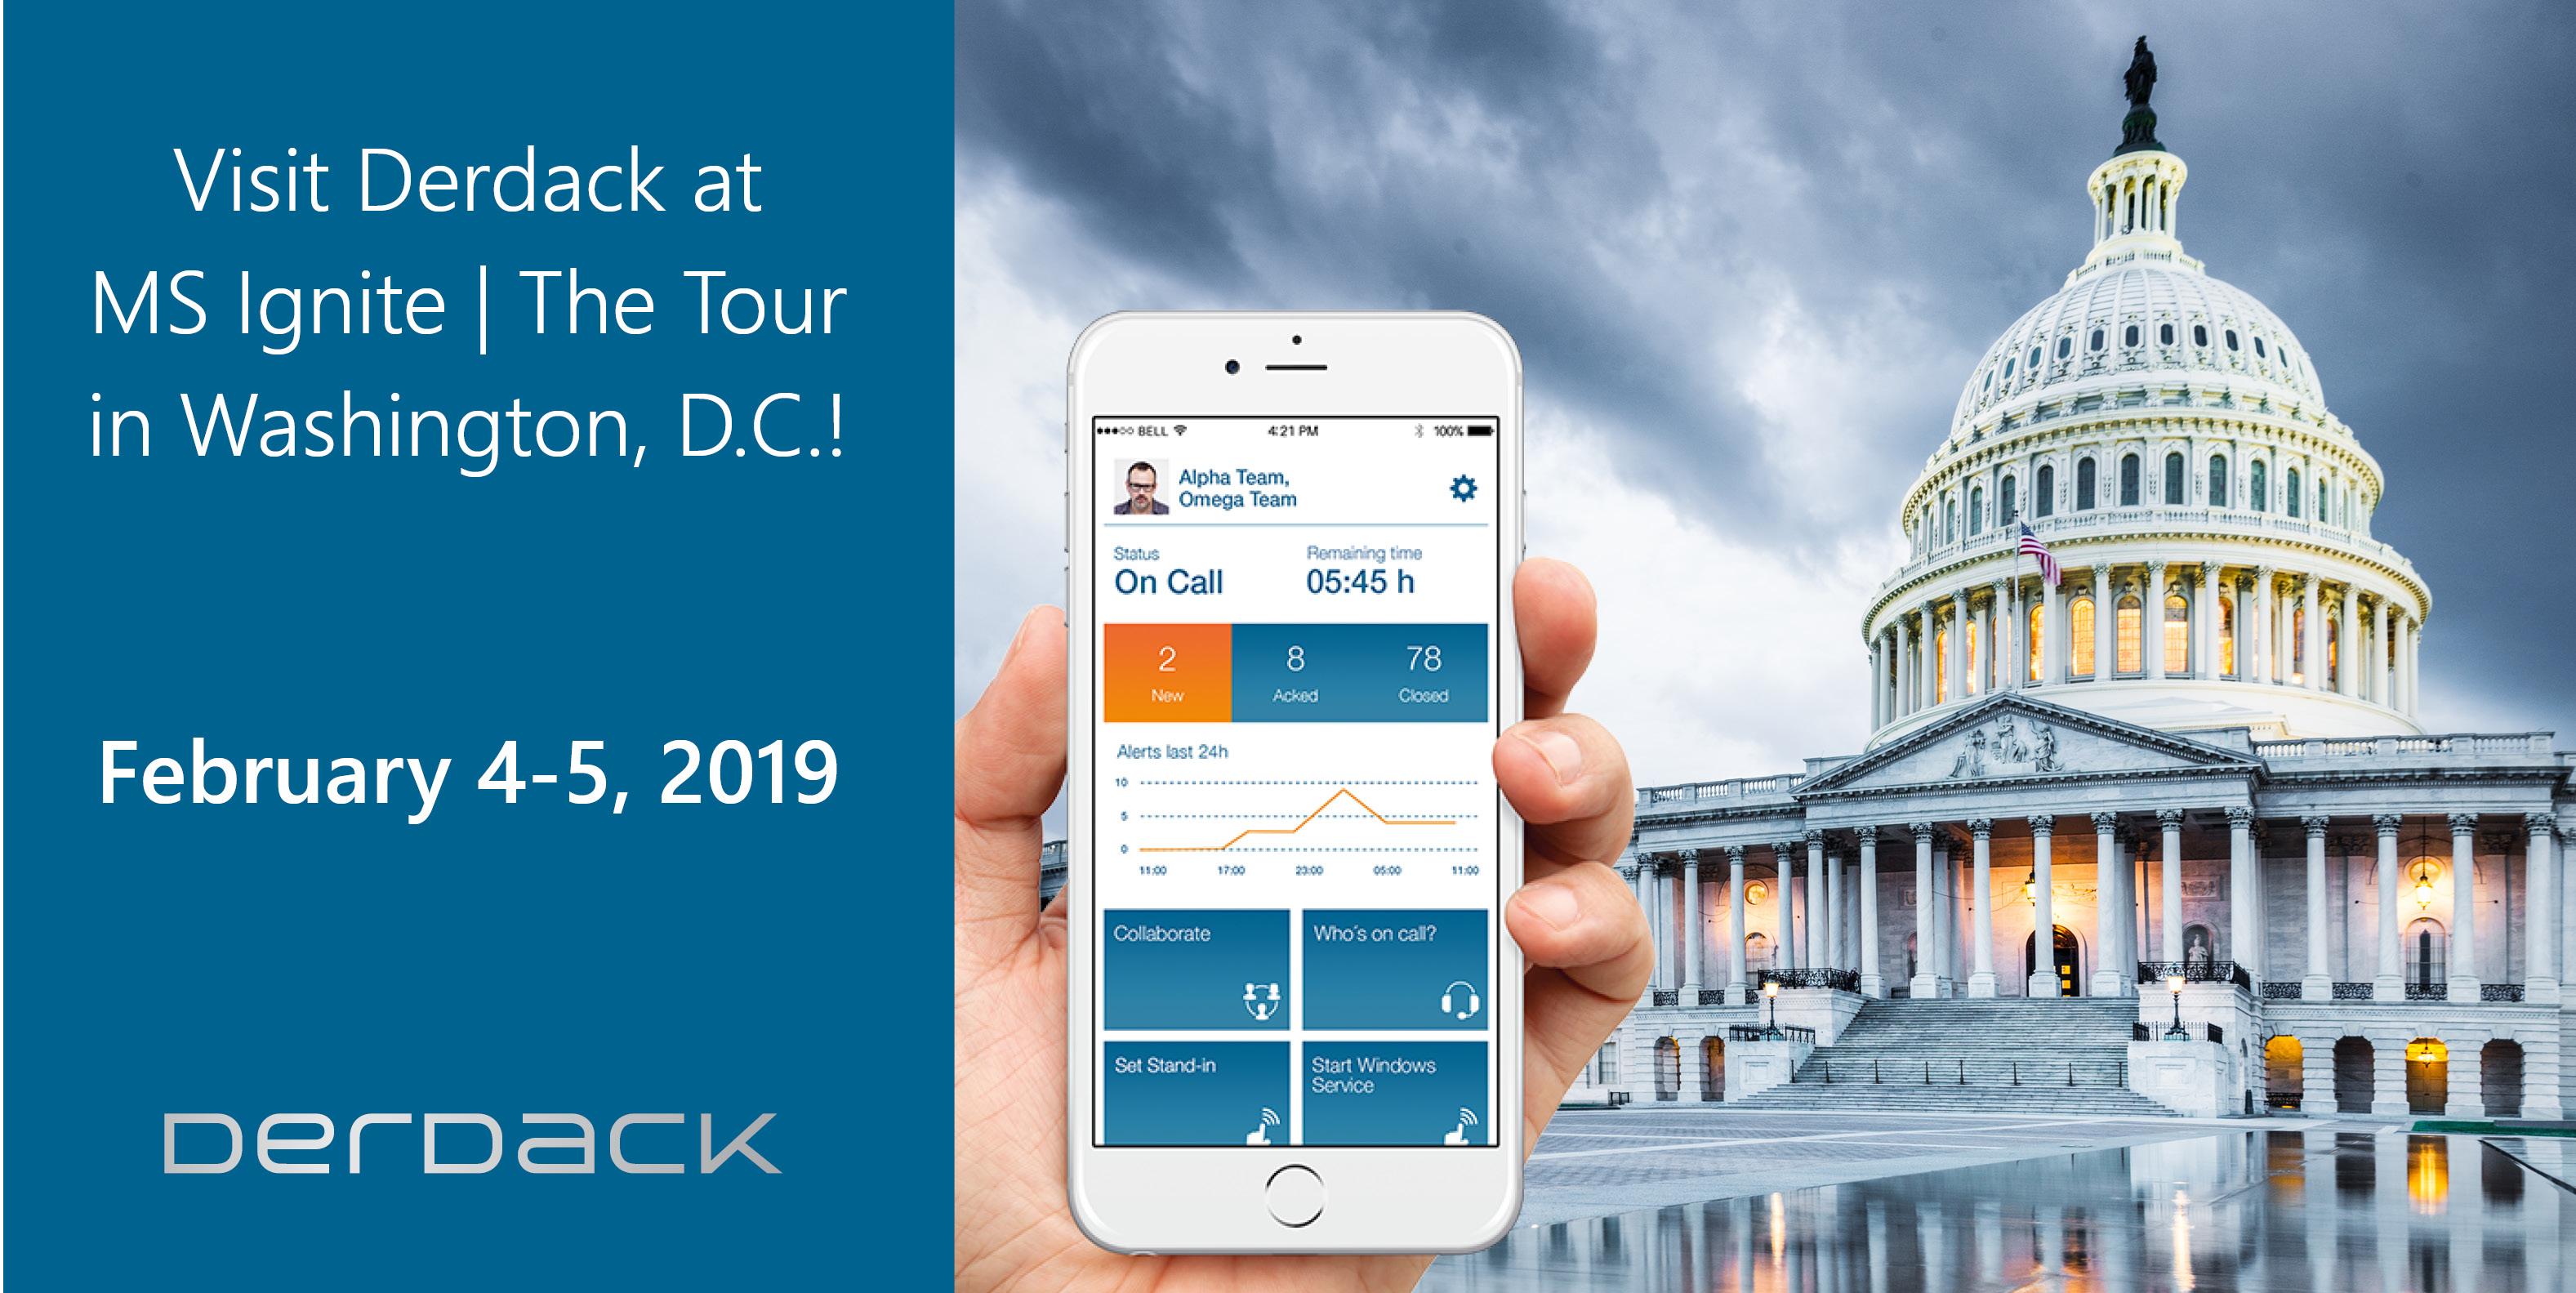 derdack microsoft ignite the tour 2019